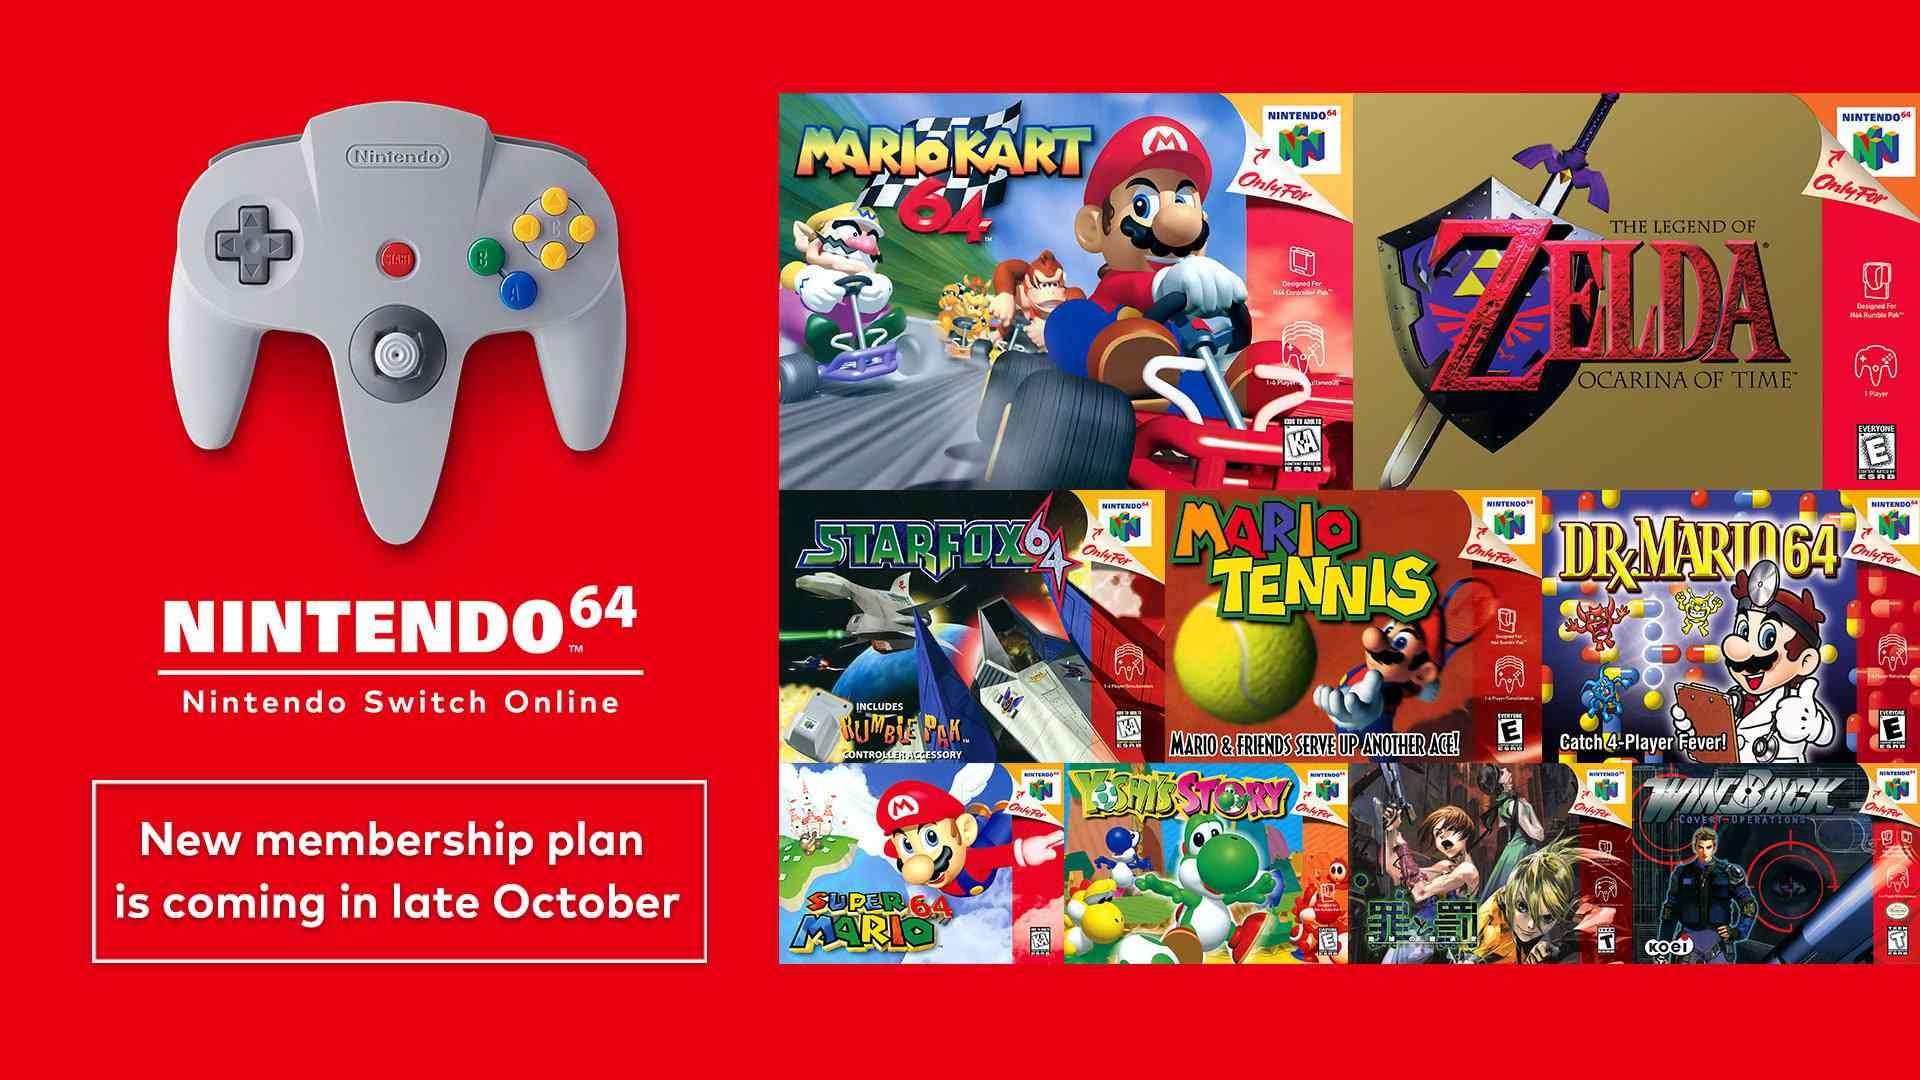 Nintendo Switch Online's new N64 membership plan